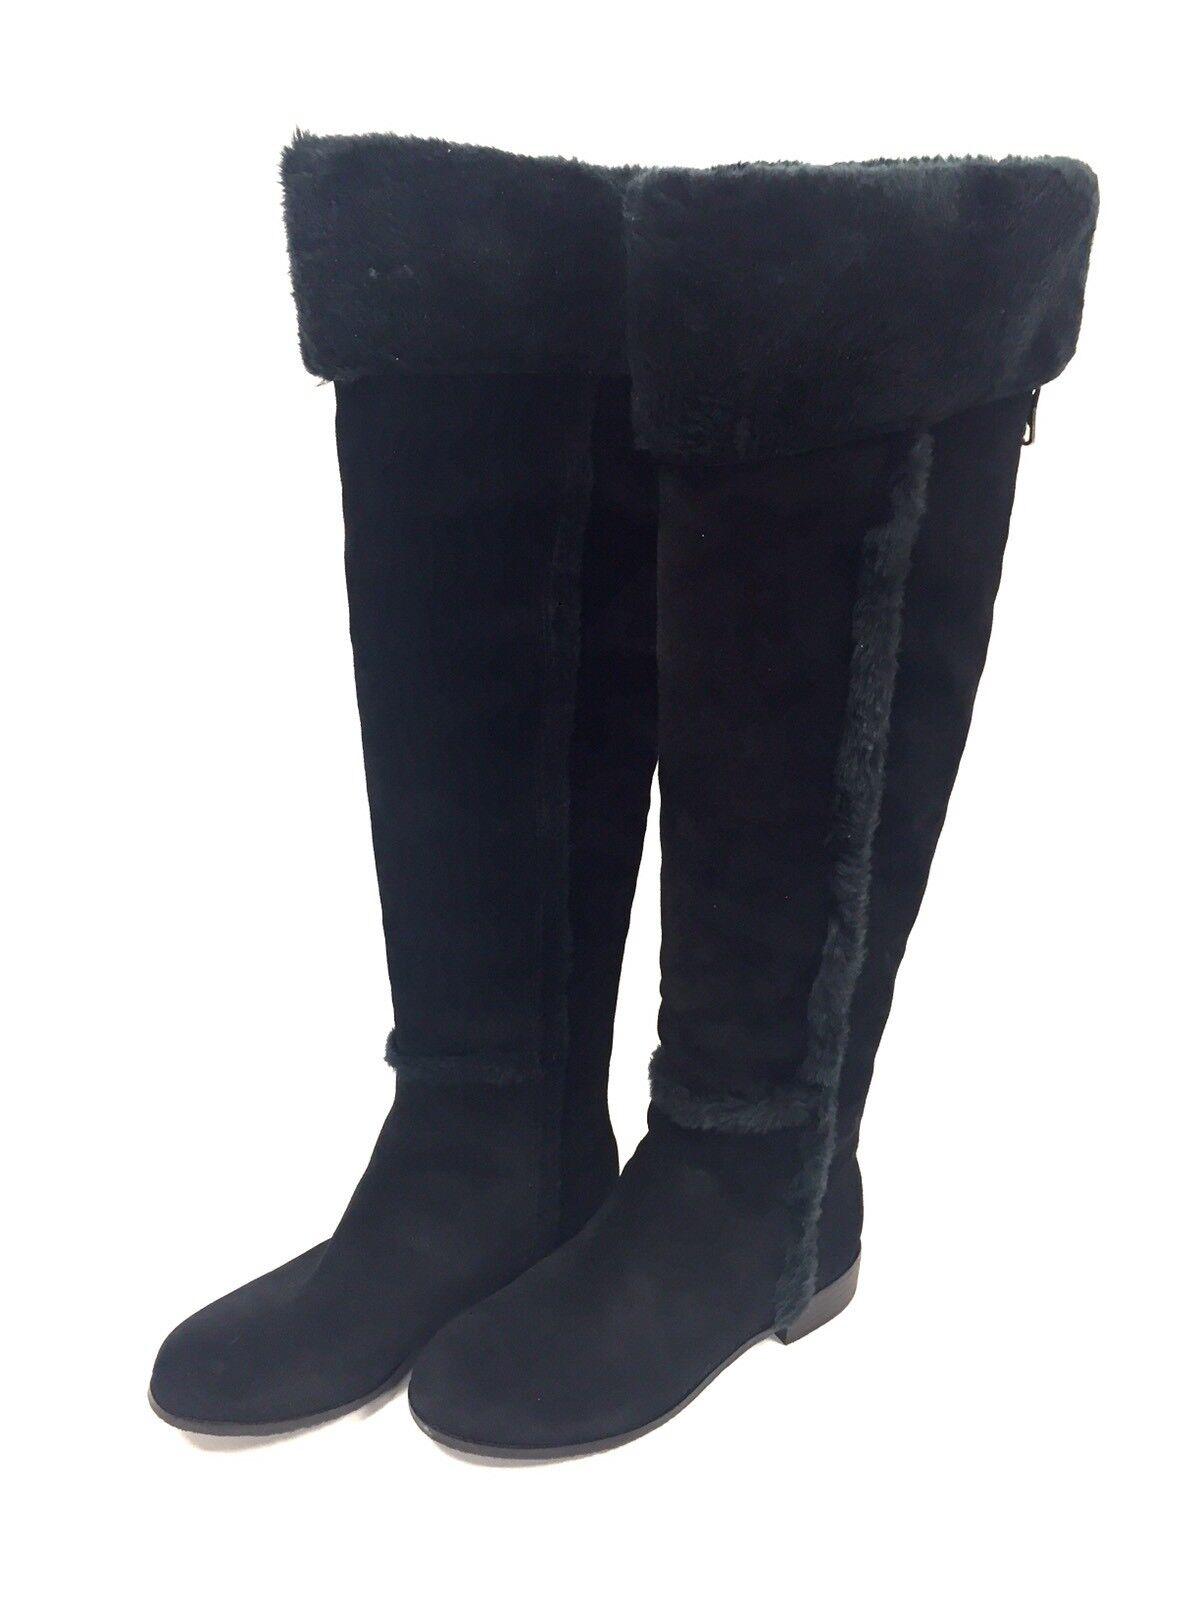 Bottes femme Cuir Noir BCBGMAXAZRIA 38 FR FR FR  8 US 30e211